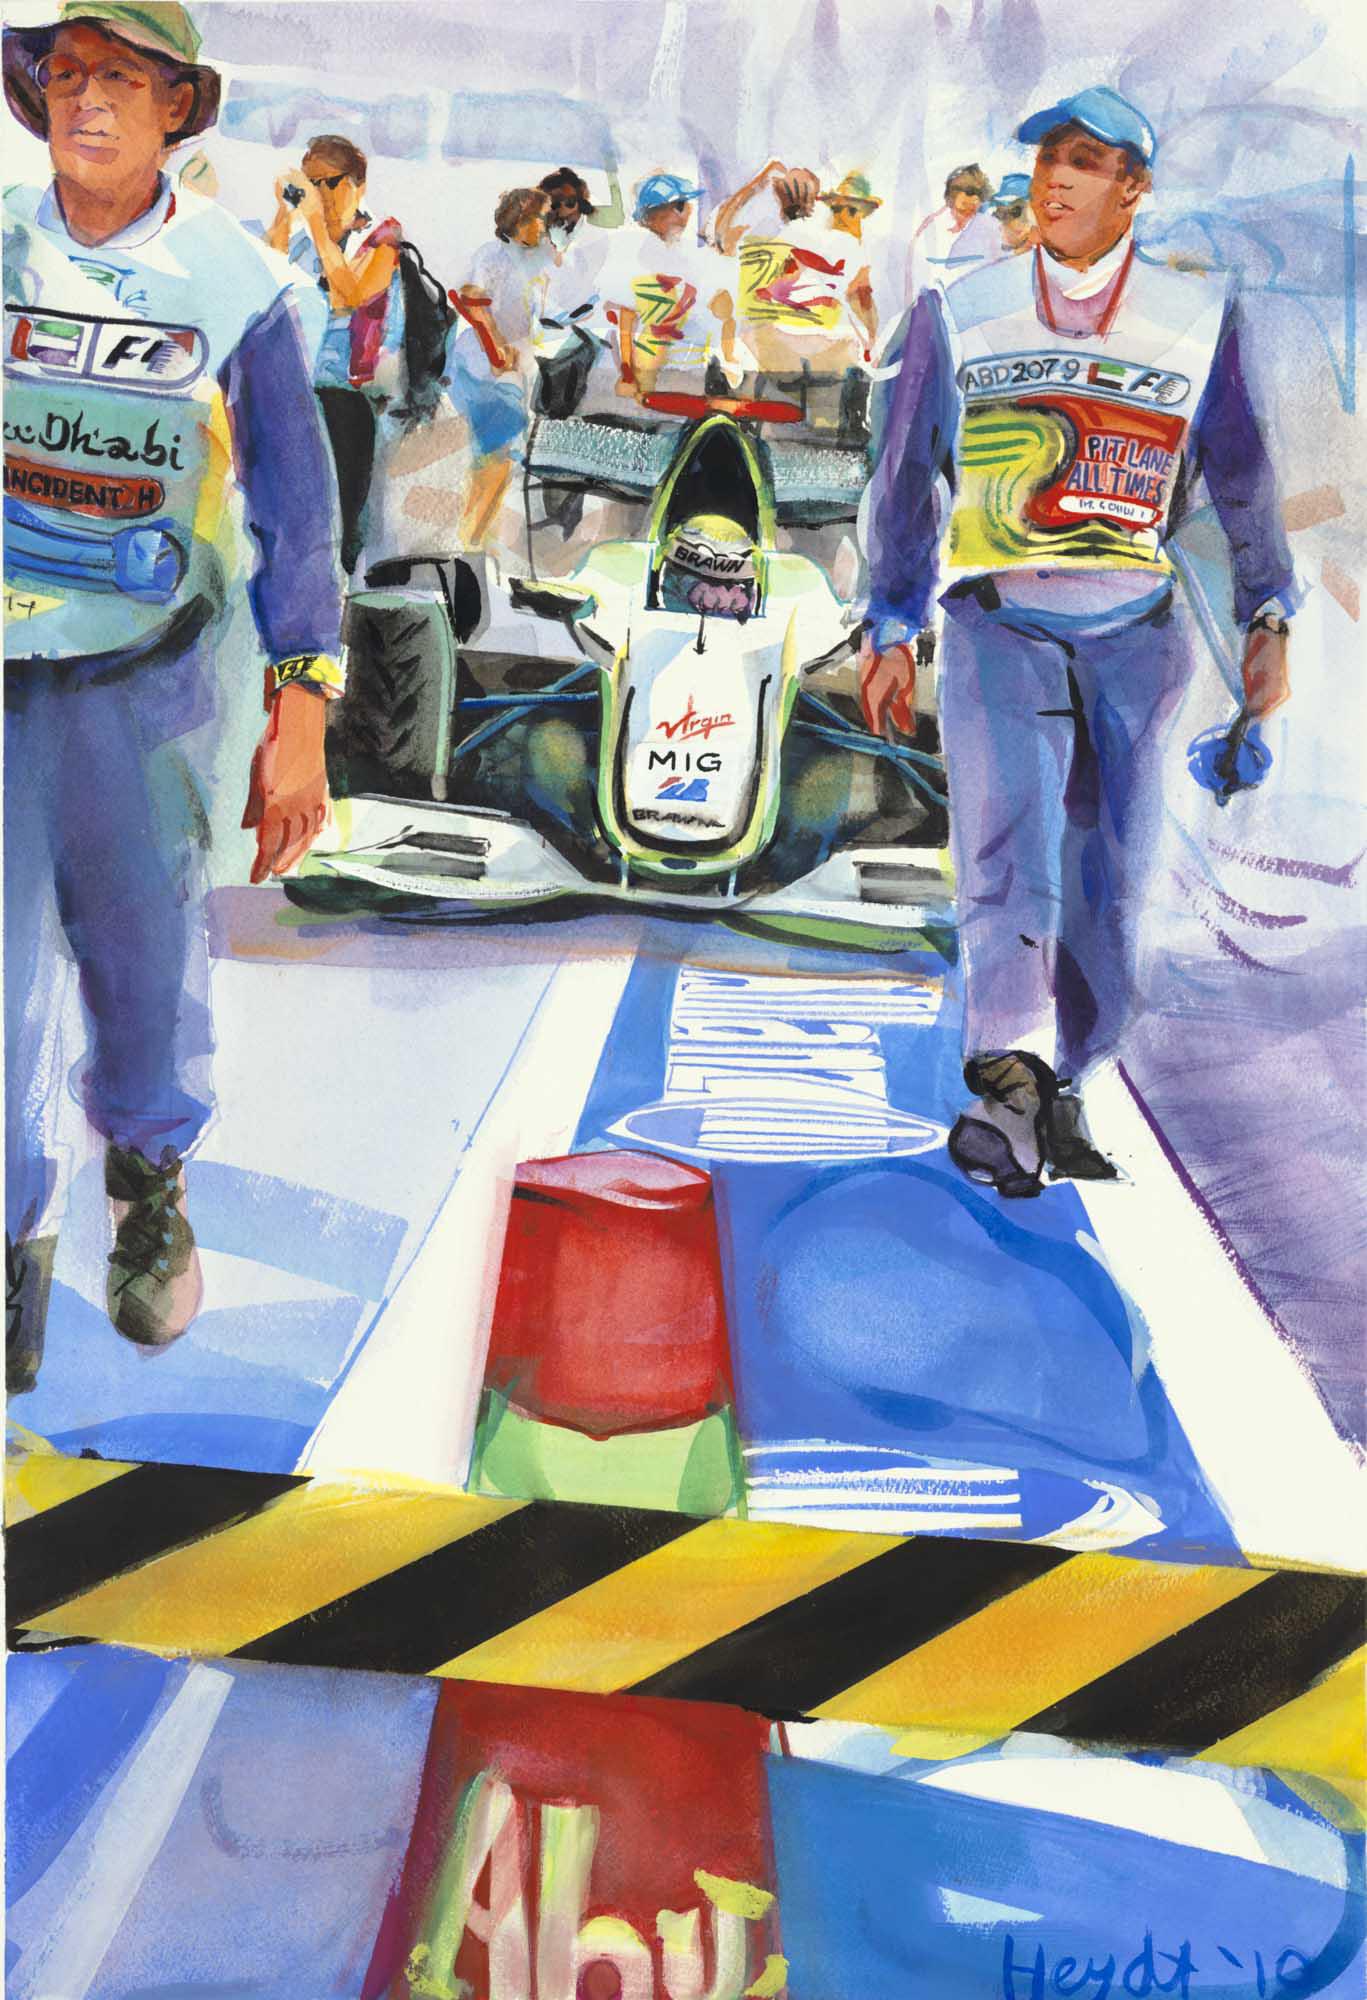 Formula1-wHEYDT-in pit lane.jpg